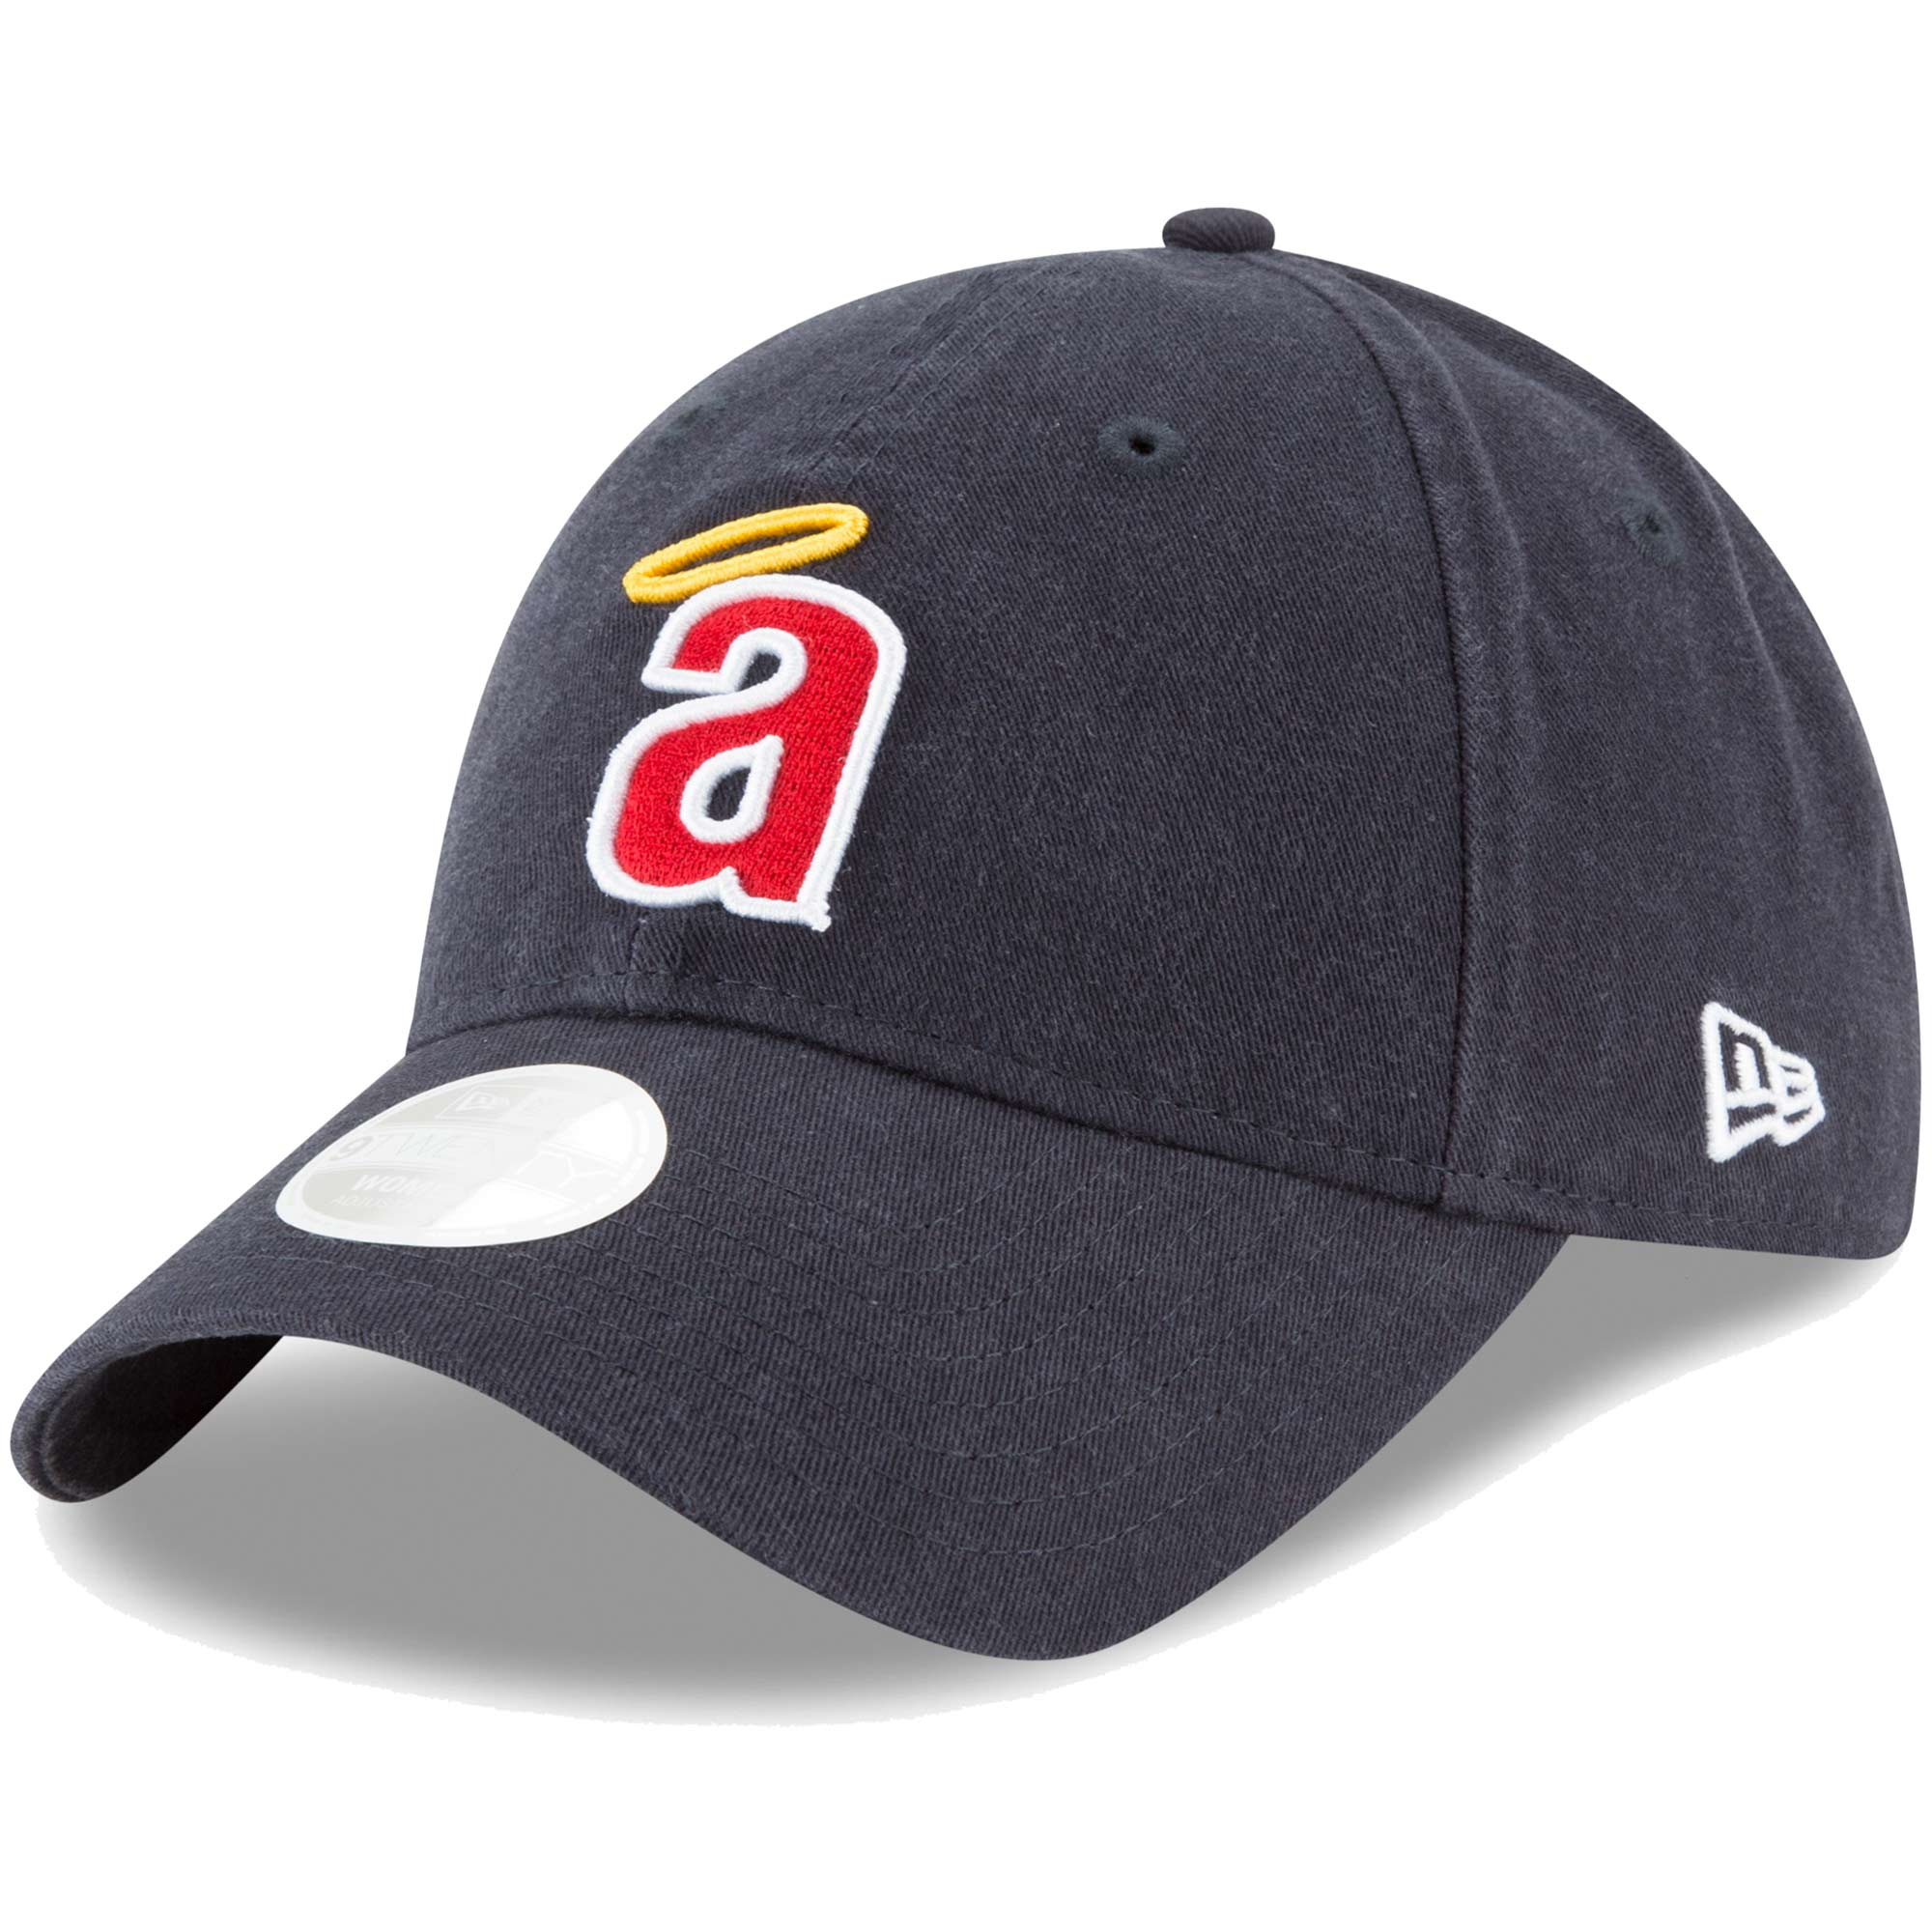 California Angels New Era Women's Core Classic Twill Team Color 9TWENTY Adjustable Hat - Navy - OSFA